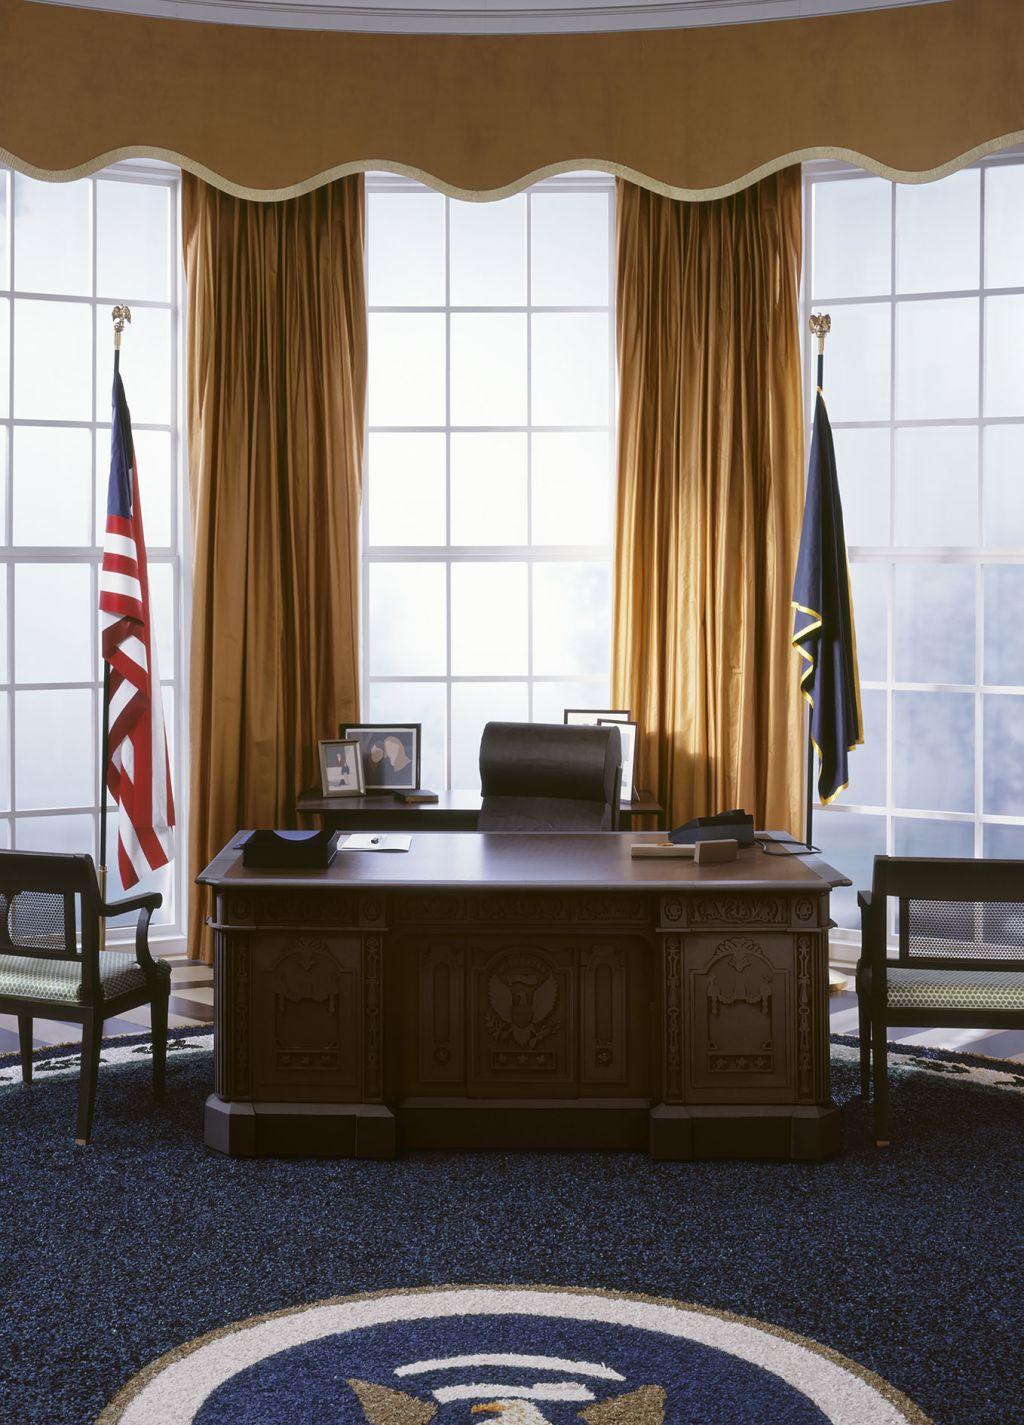 Thomas Demand – Presidency – London